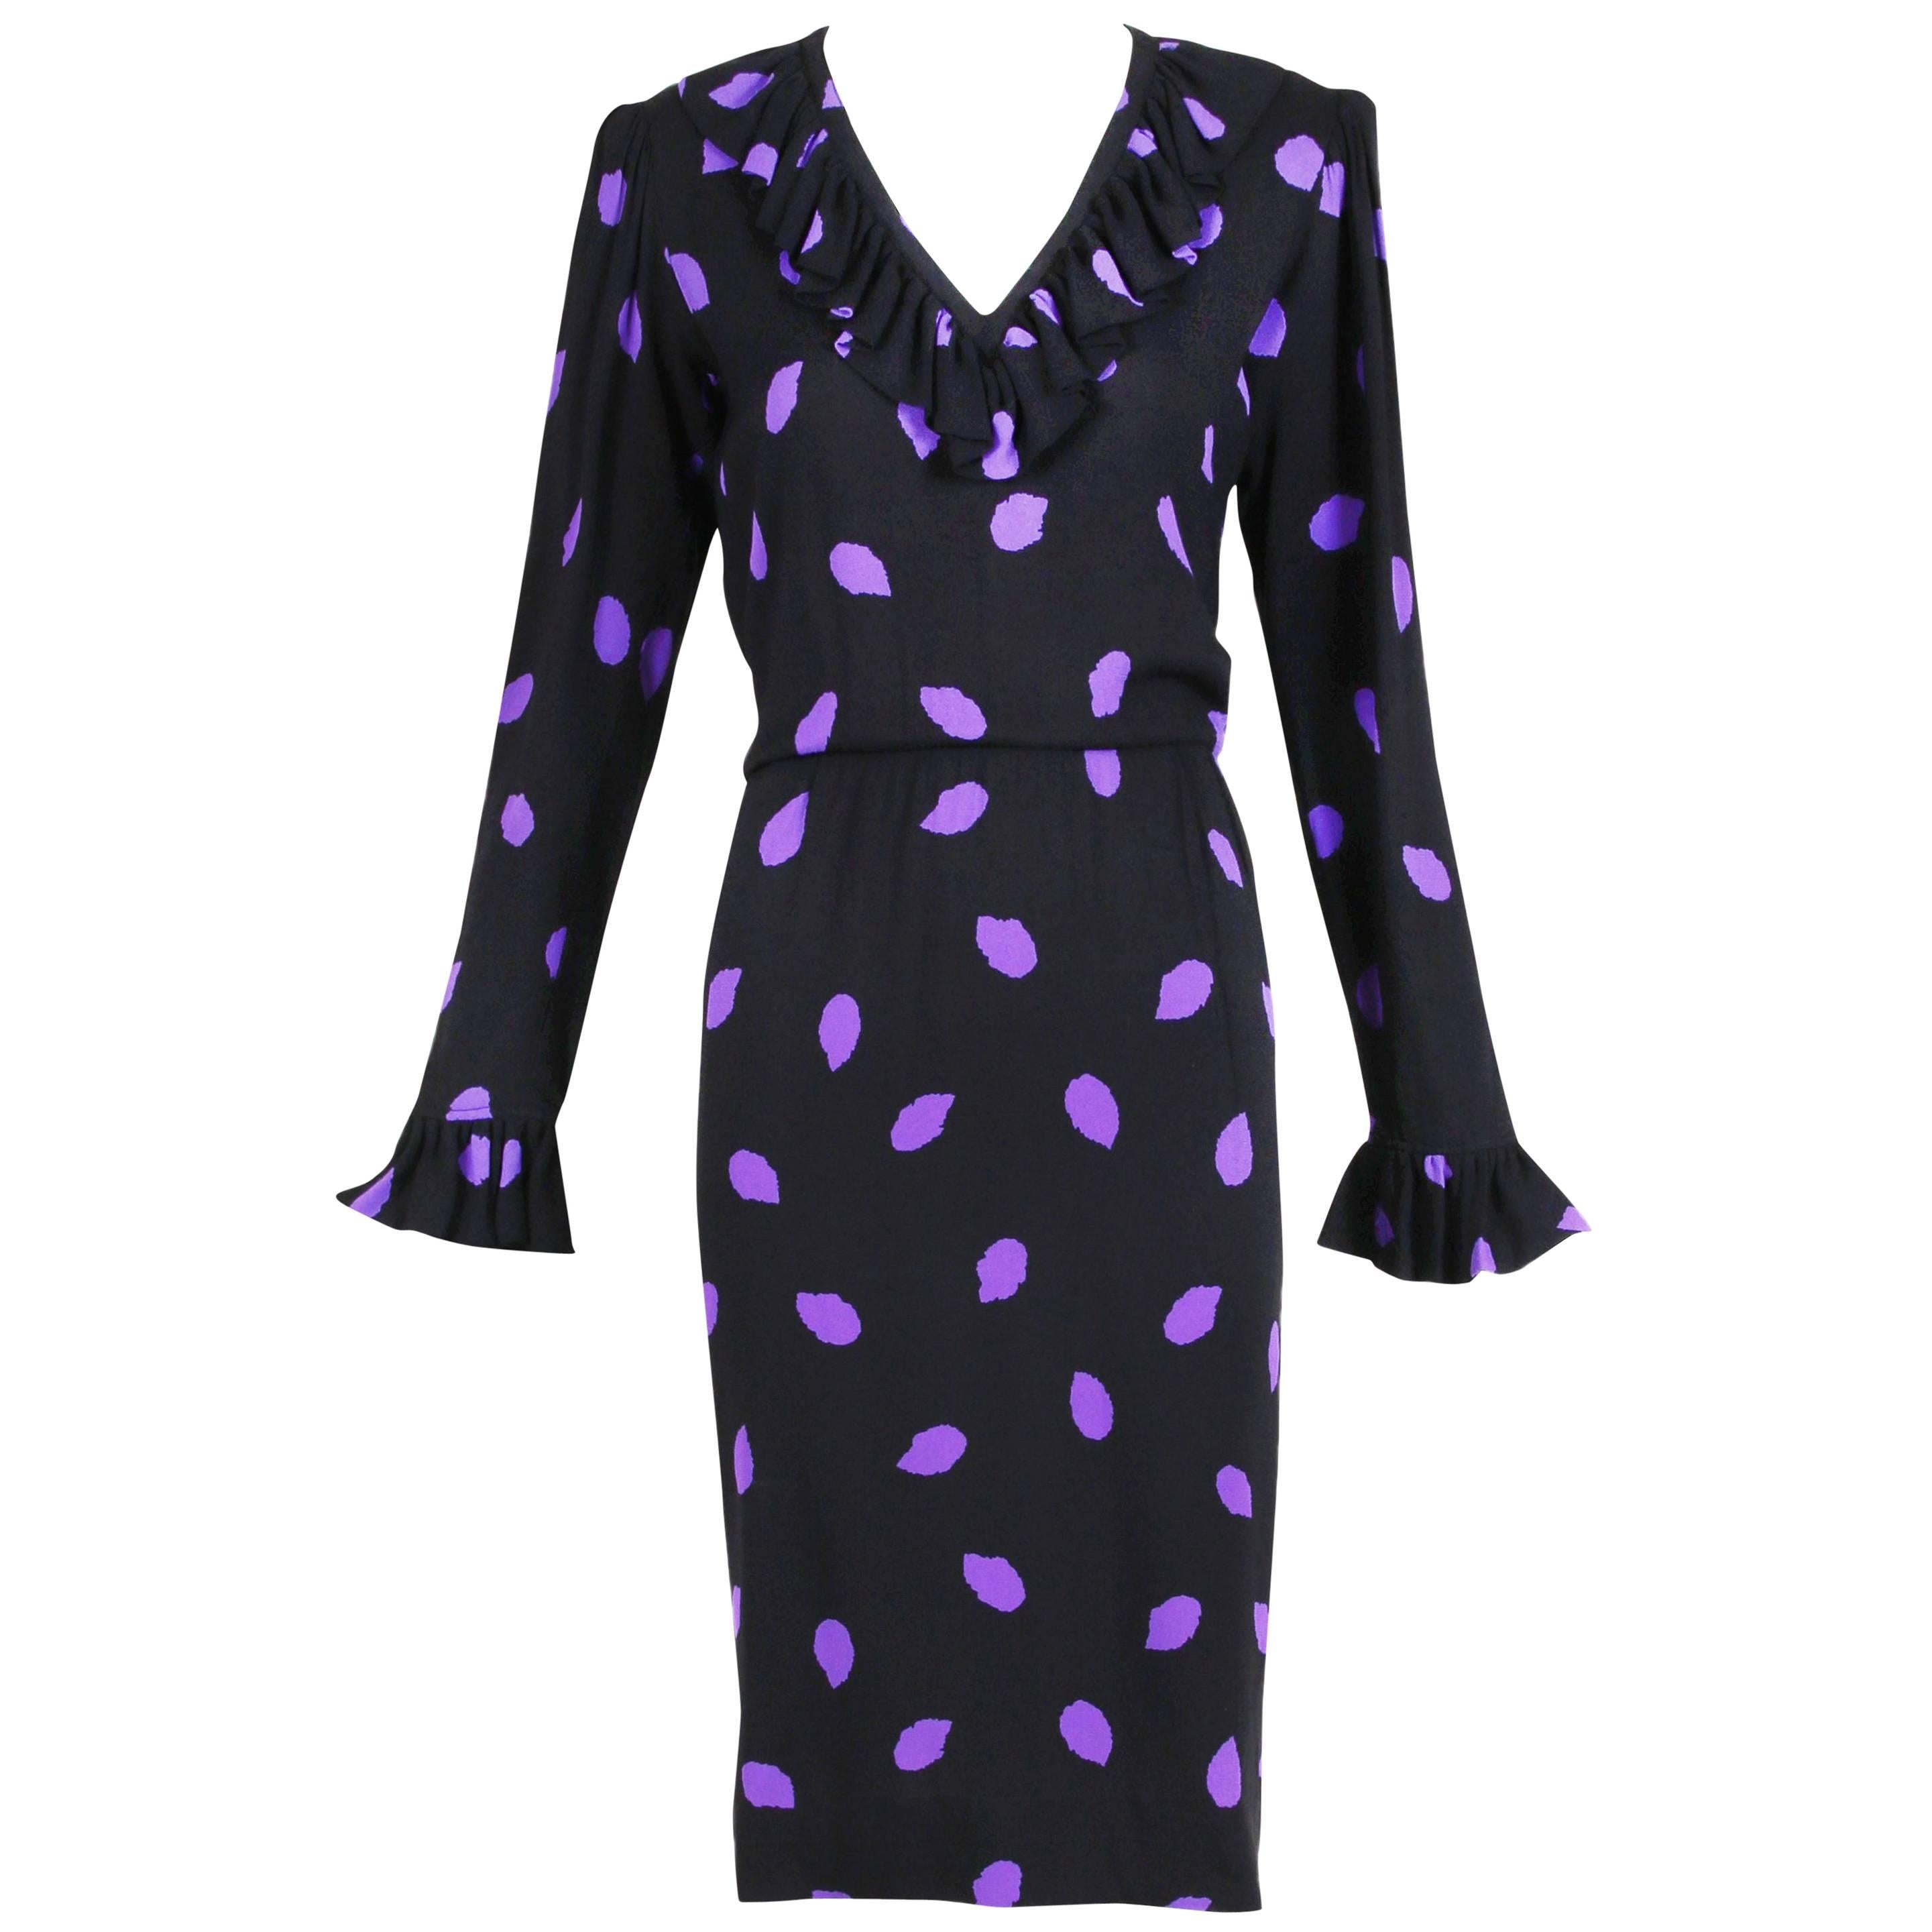 Yves Saint Laurent Black & Purple Abstract Print Day Dress w/Ruffled Trim